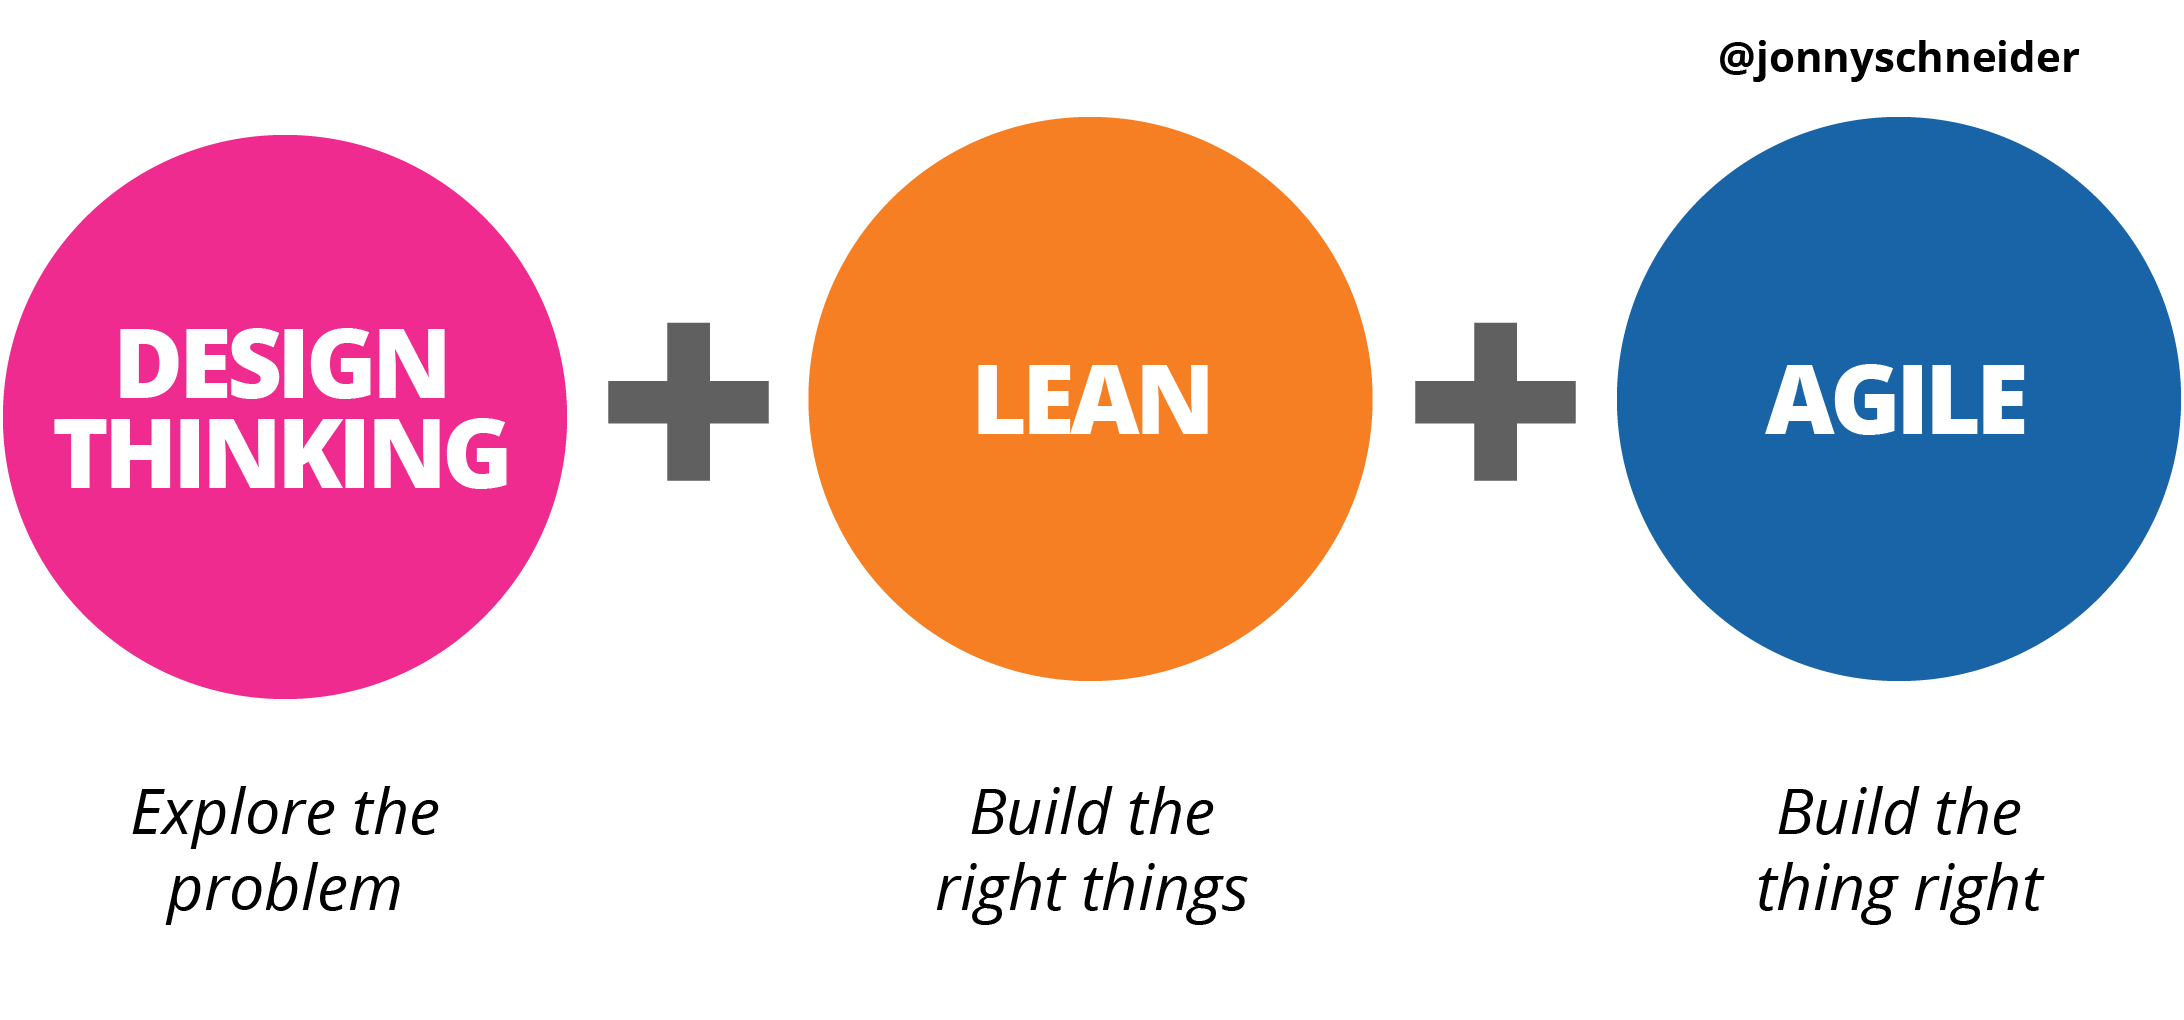 Figure 1. Three mindsets of product development